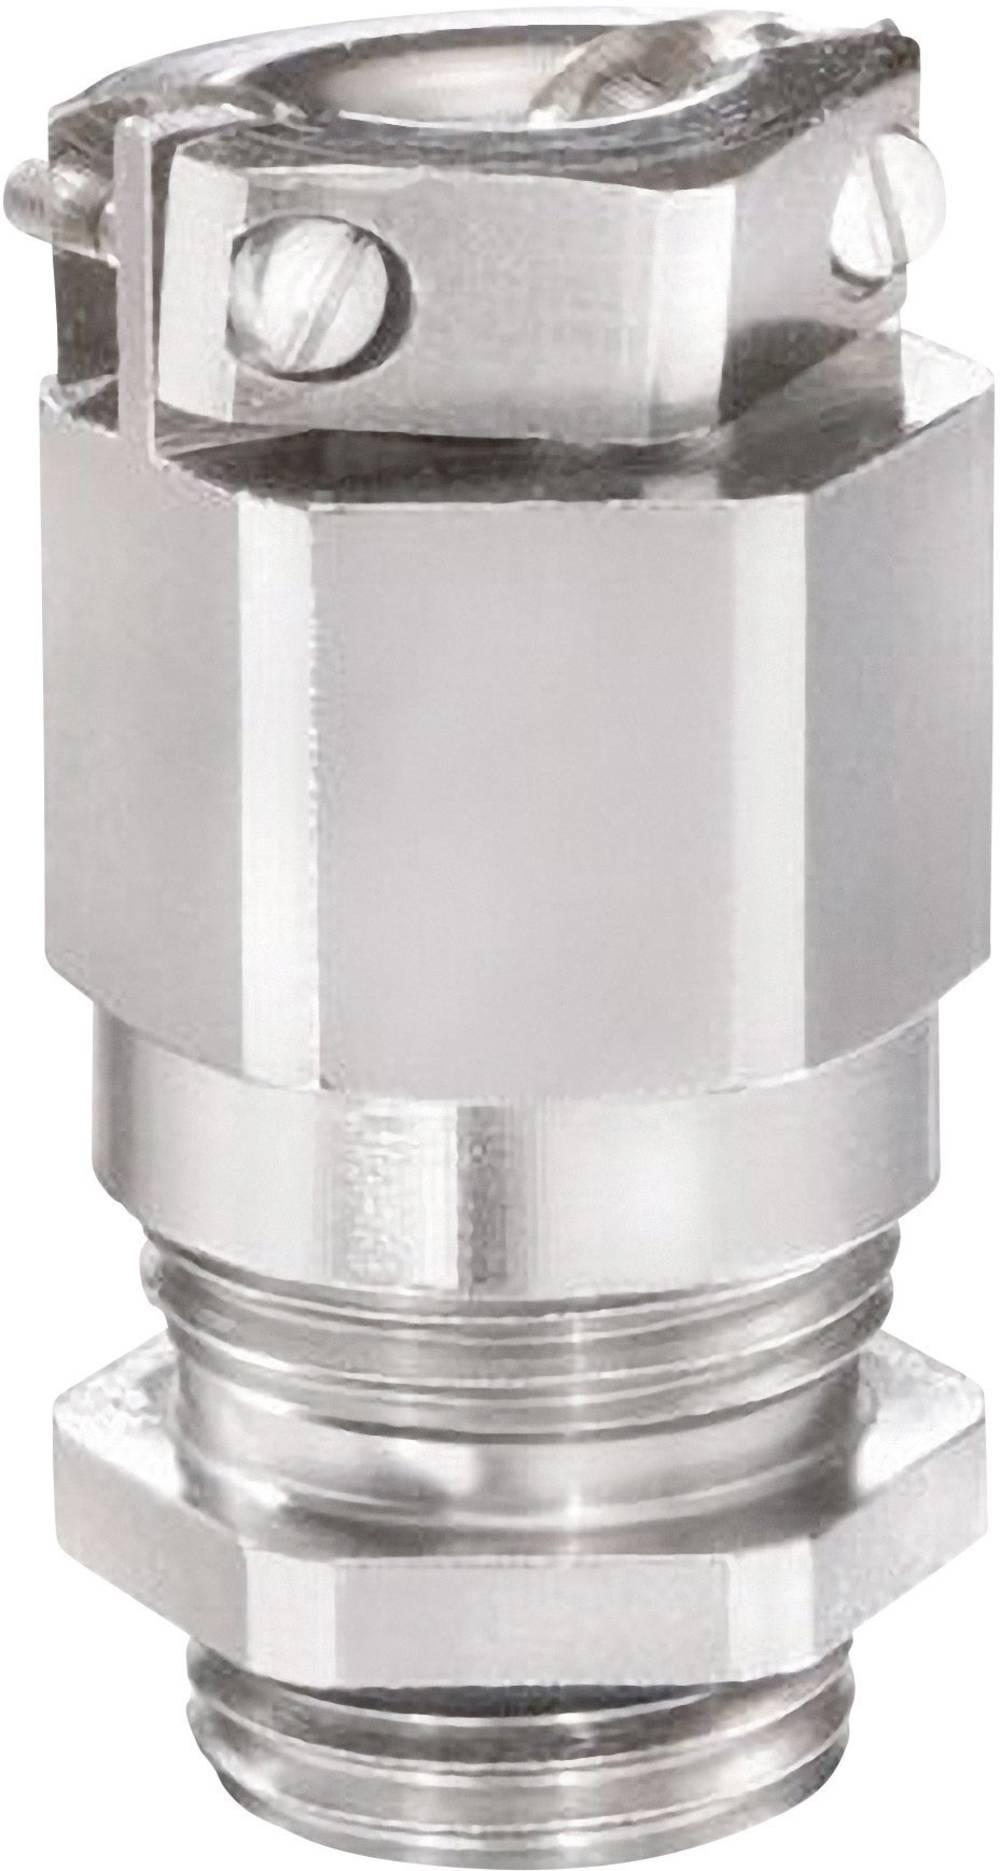 Kabelforskruning Wiska EMSKVZ16 M16 Messing Messing 50 stk